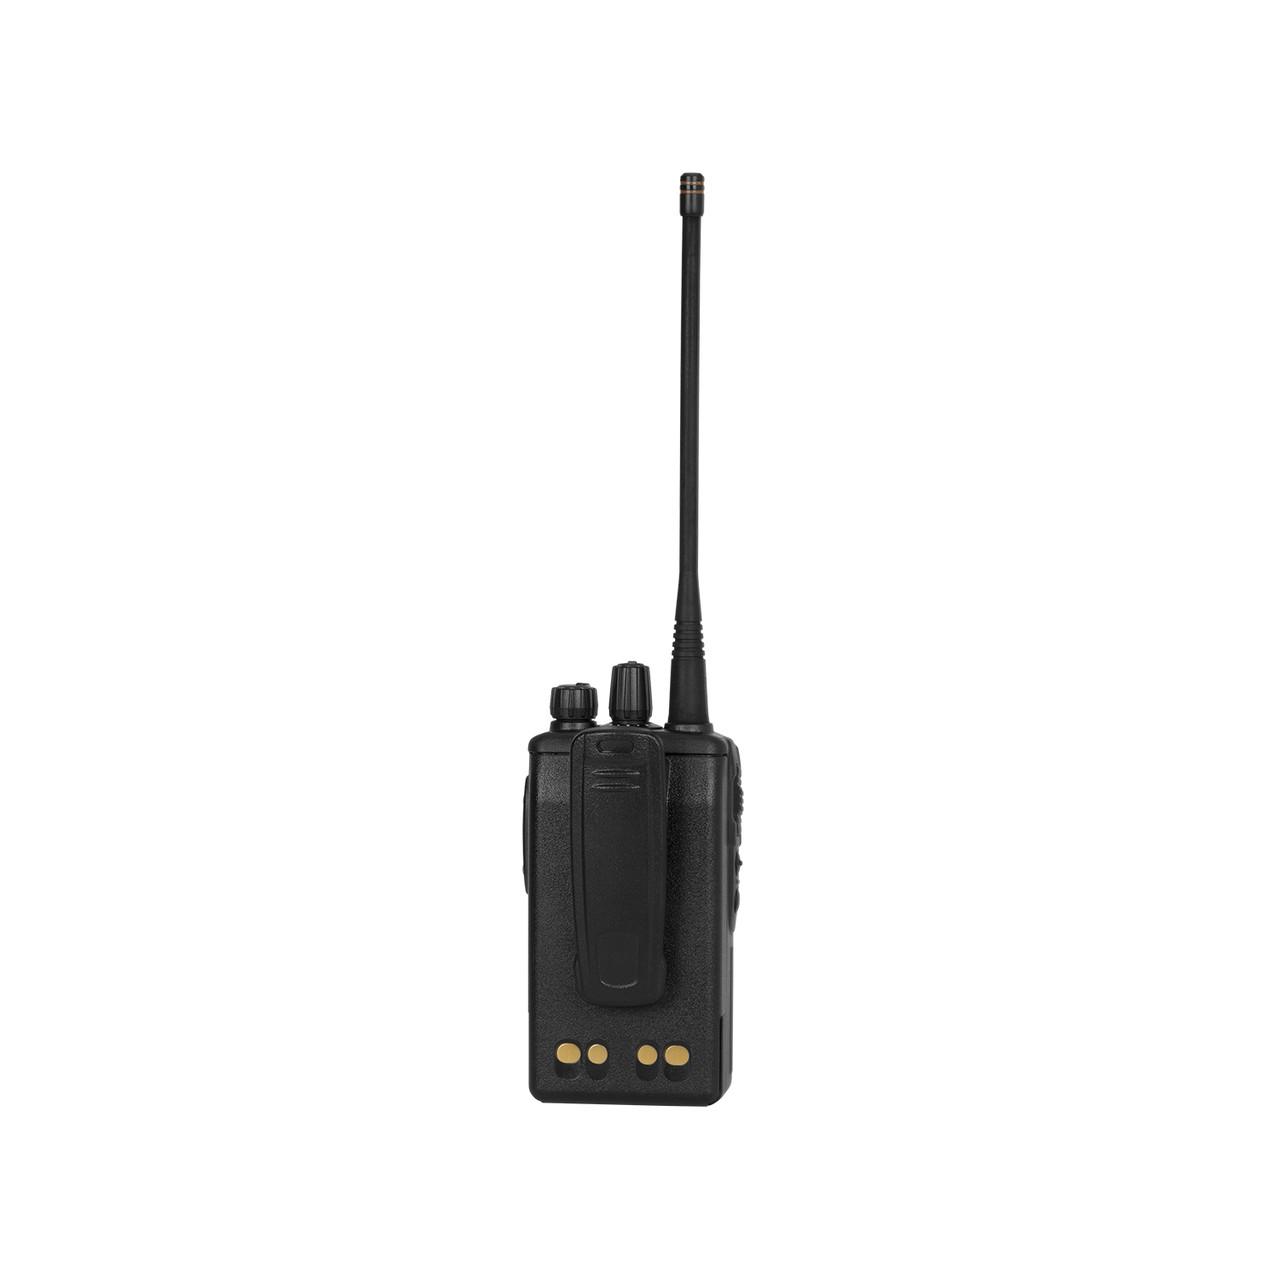 Motorola VX-264 5 Watt UHF or VHF 2 Way Radios